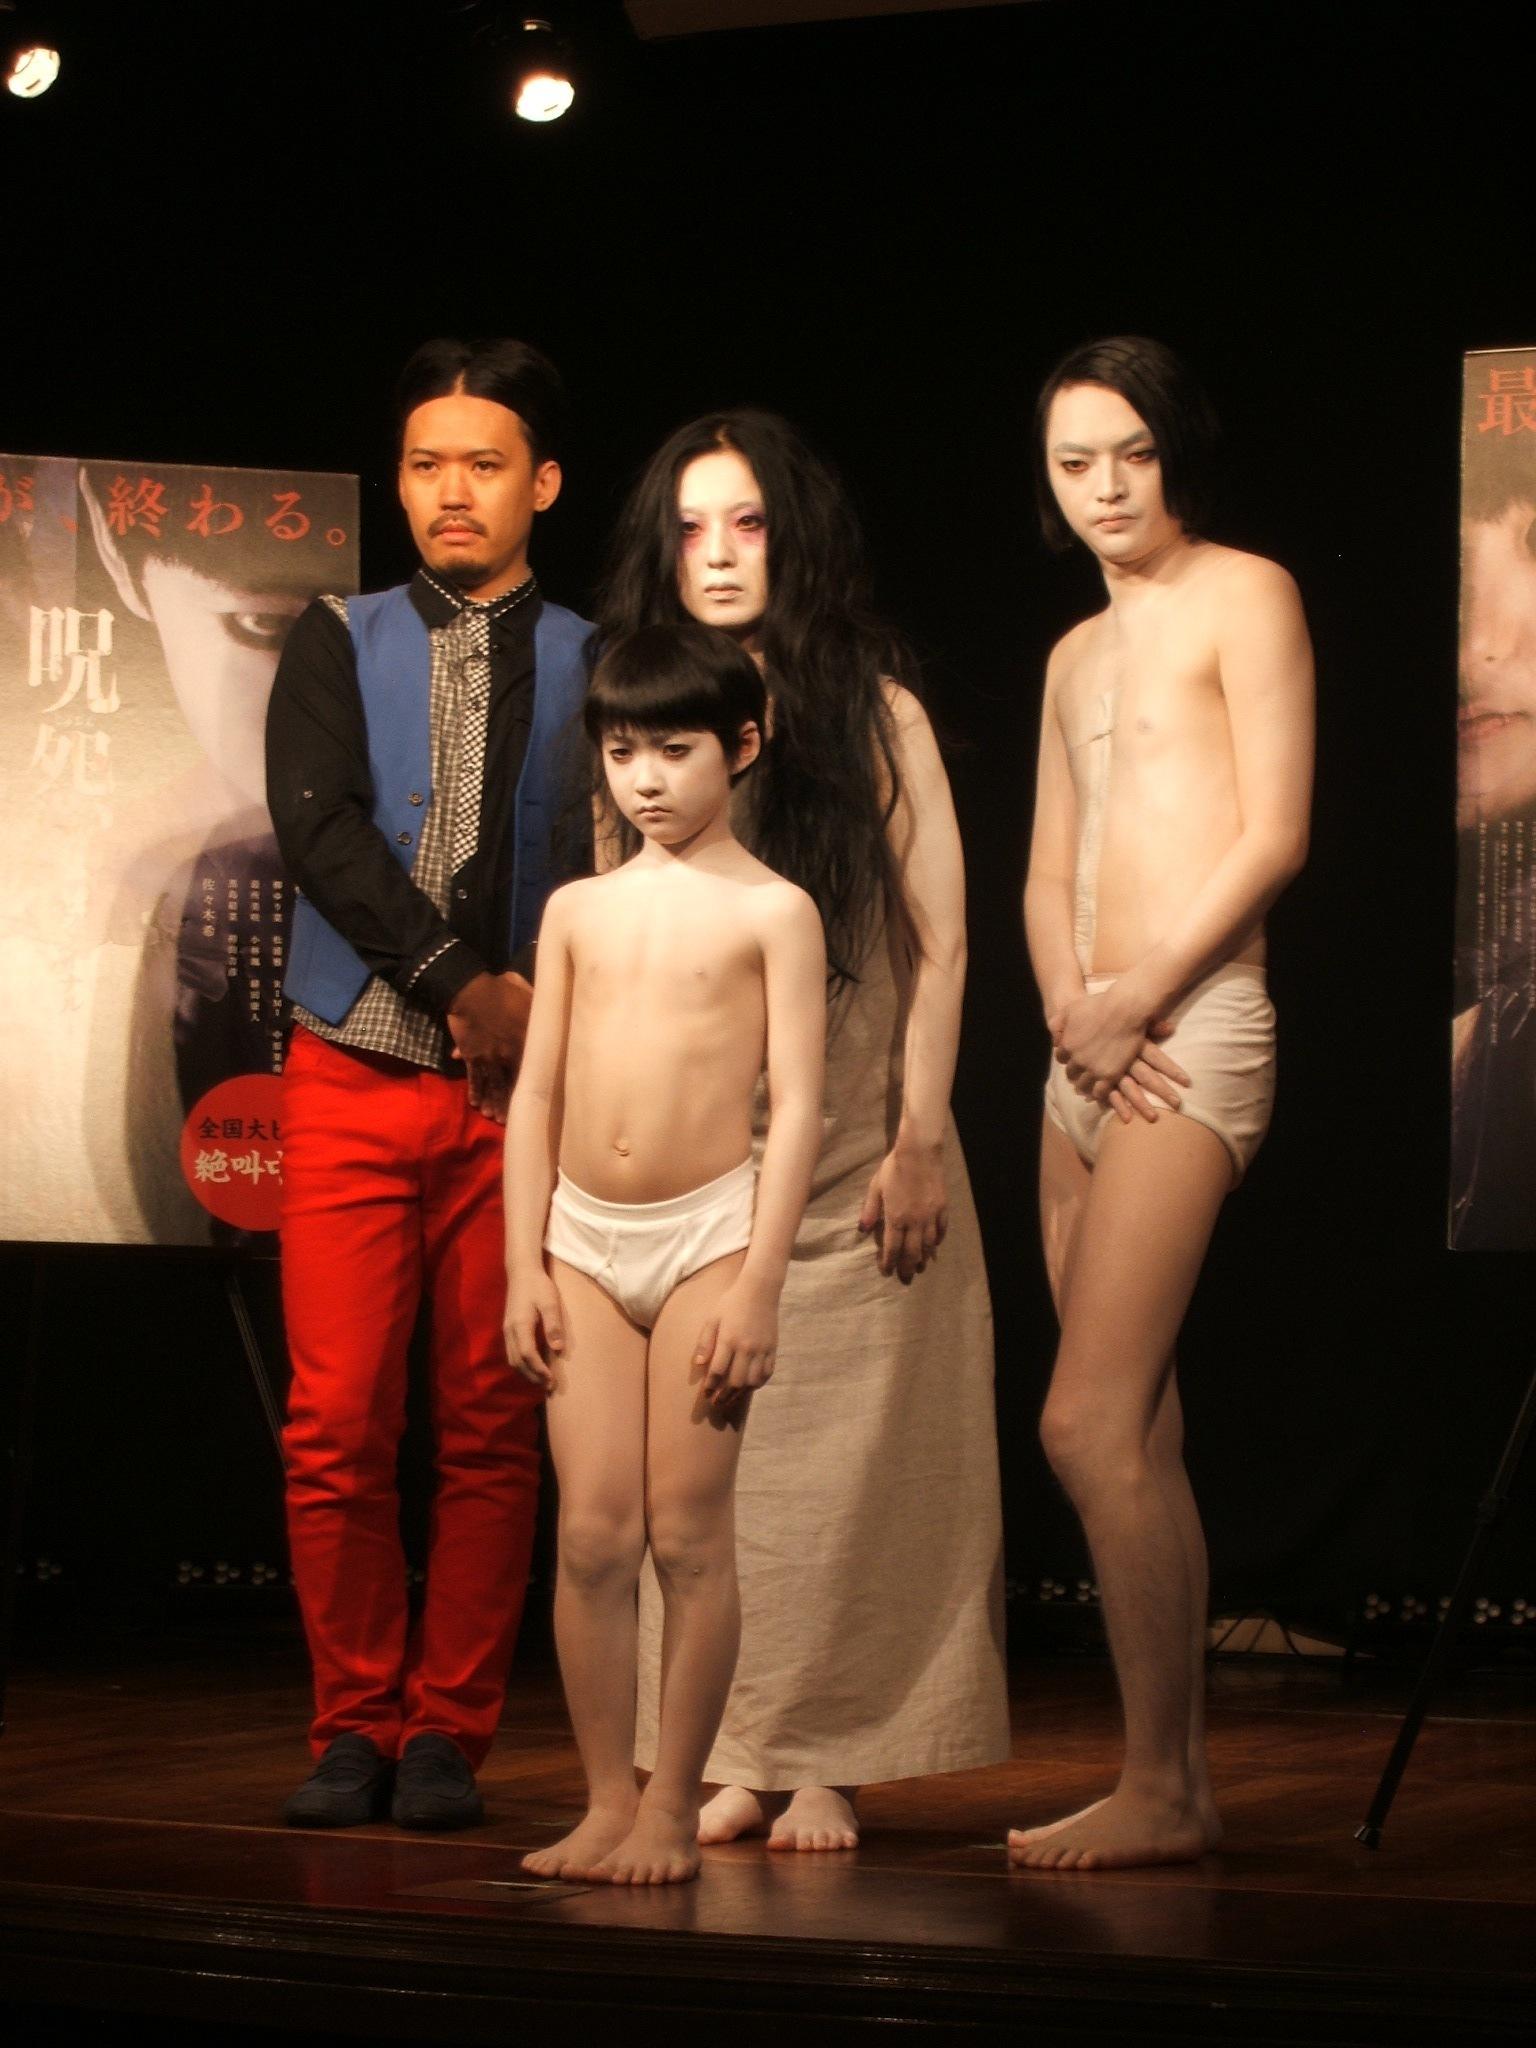 http://news.yoshimoto.co.jp/photos/uncategorized/2015/06/30/20150630235142-9a46eacb3e8074a88a52b8f3ca3905a9824de48a.jpg